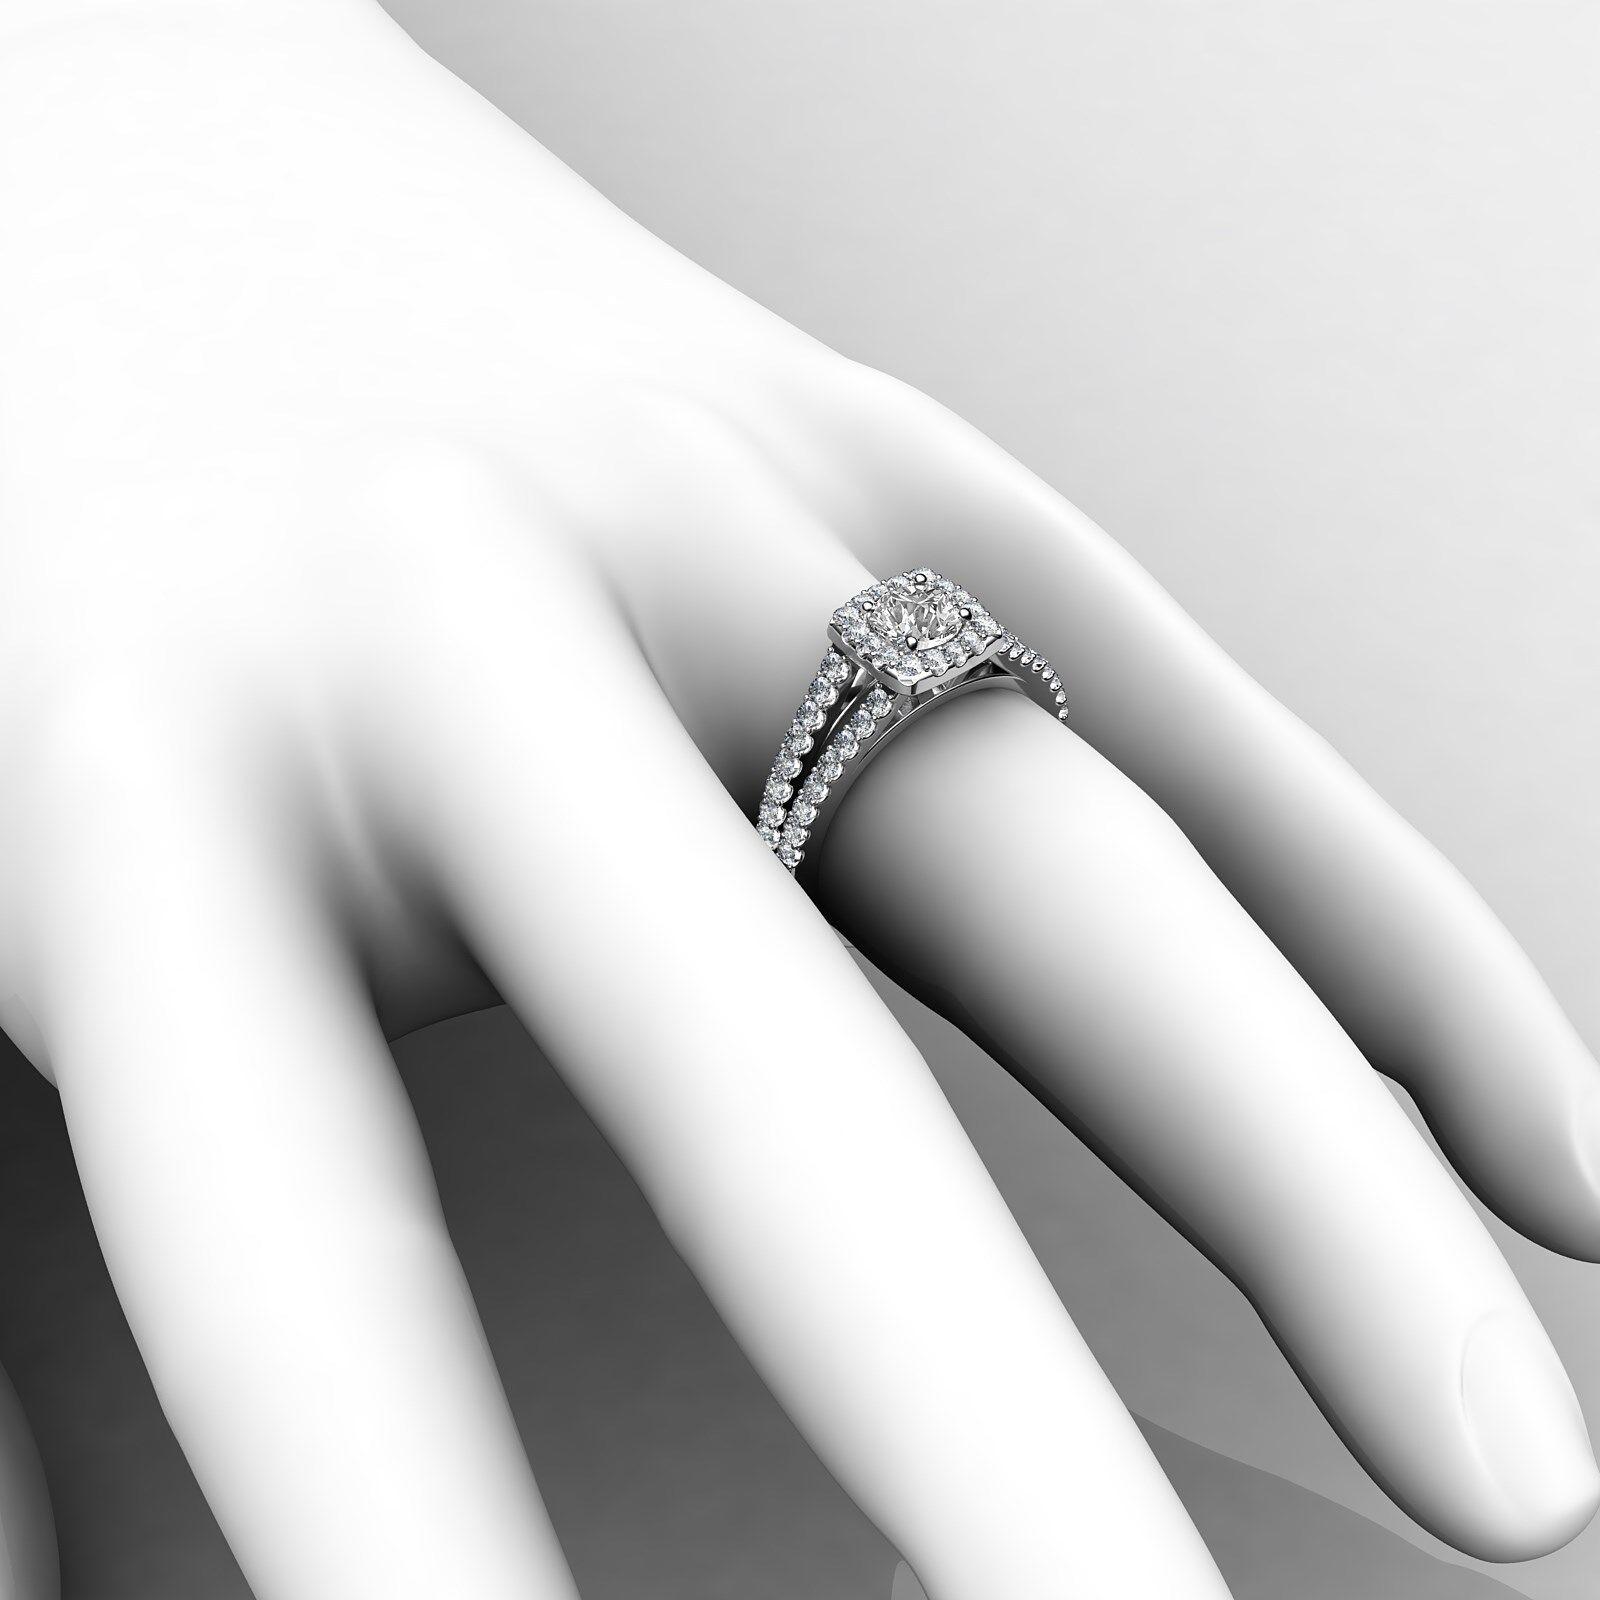 Round Diamond Engagement Halo Split Shank Ring GIA E VVS1 14k White Gold 1 1/4ct 8